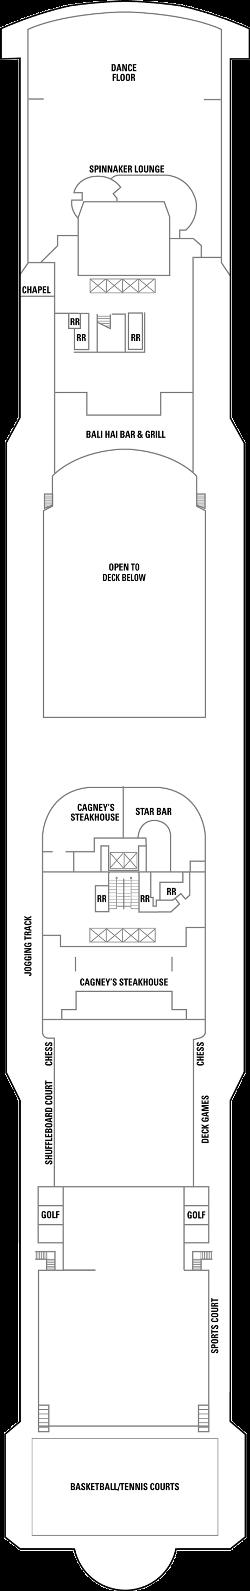 Norwegian Gem Deck 13: Deck 13